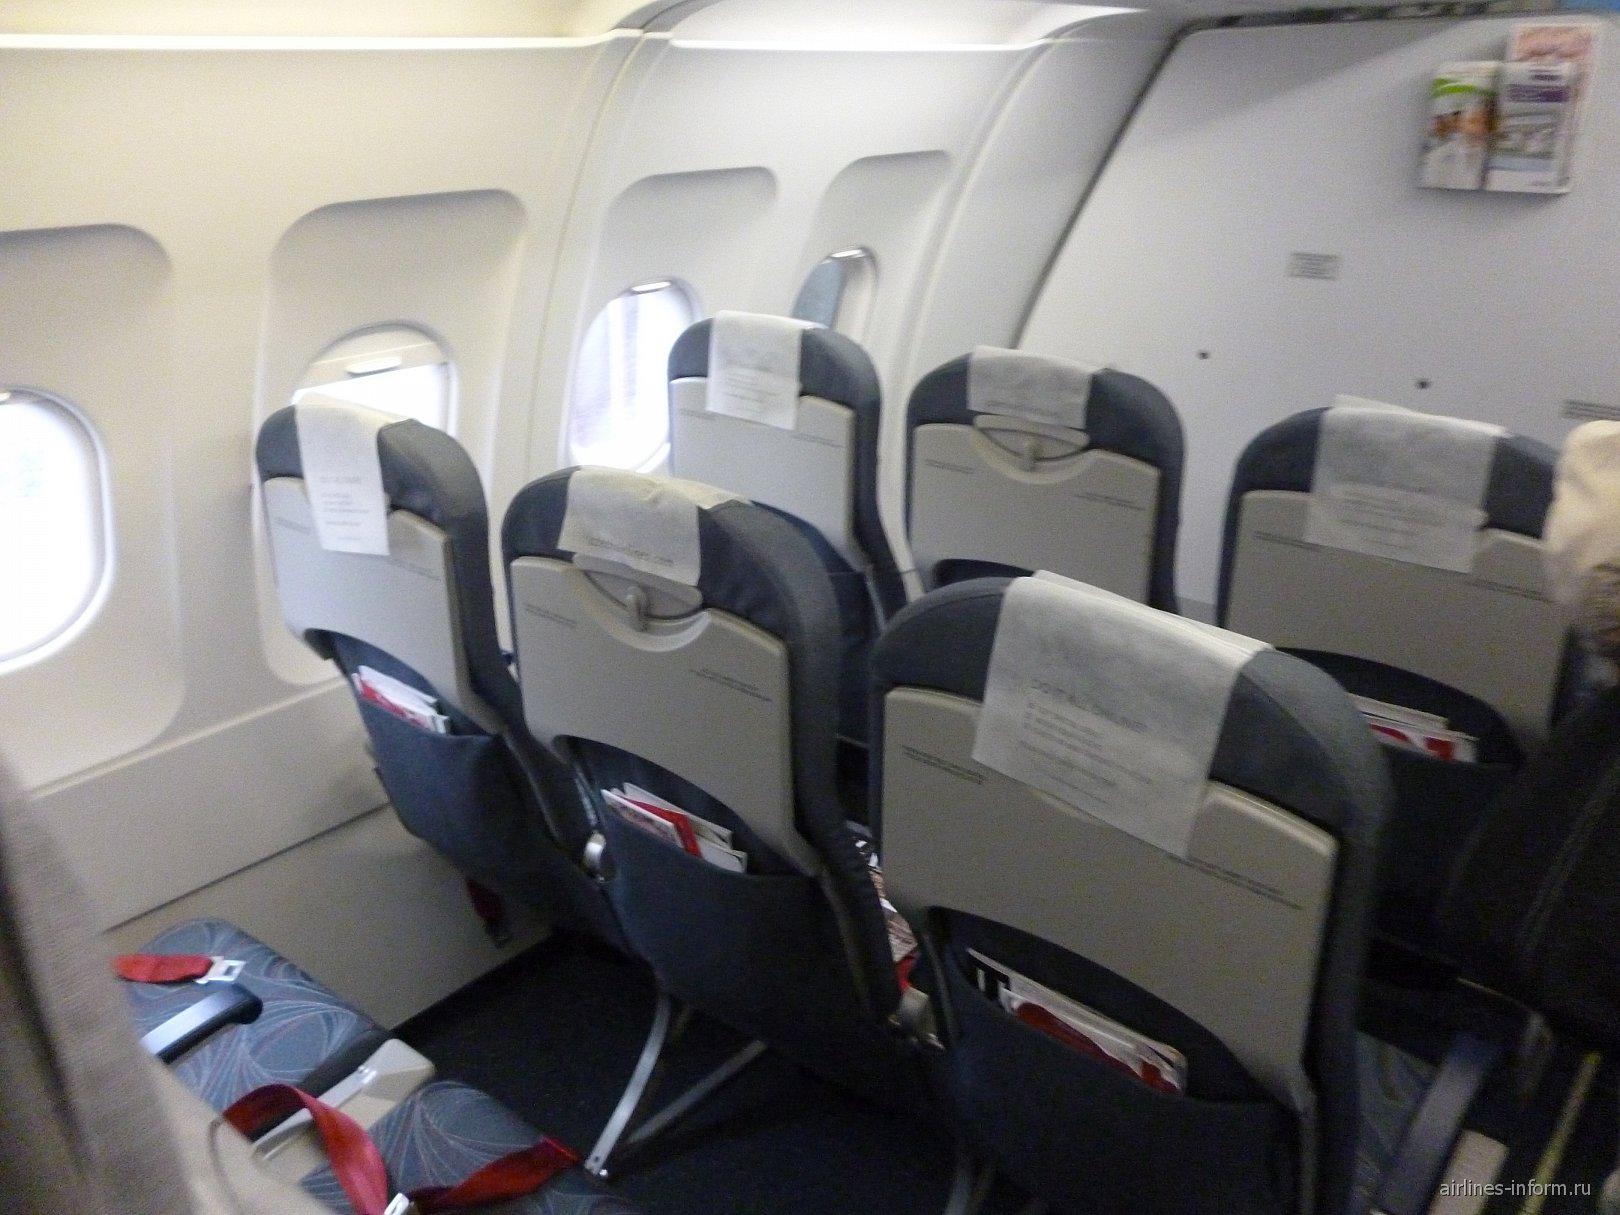 Пассажирский салон в самолете Airbus А320 авиакомпании CSA